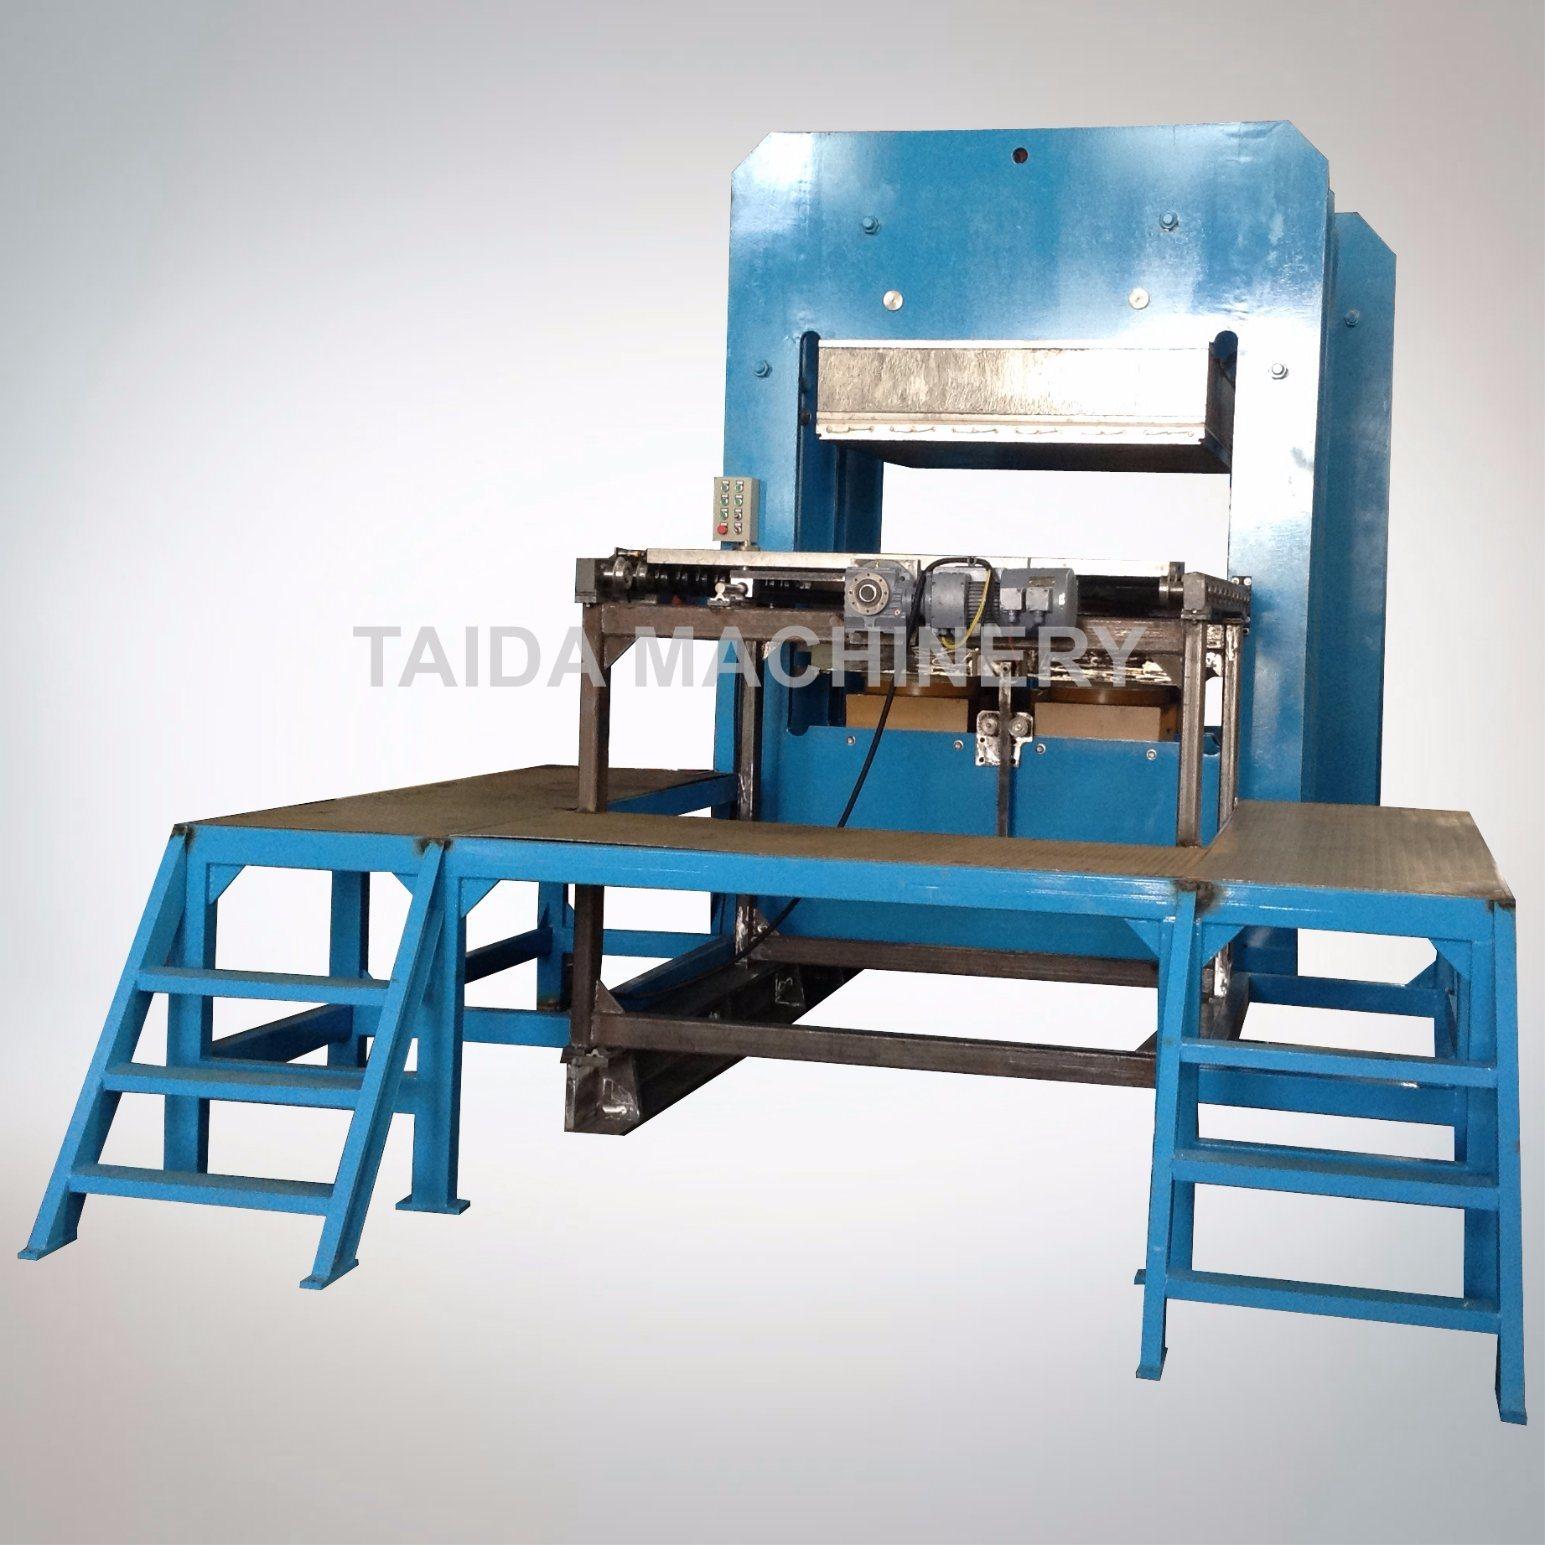 PLC Controlled Rubber Molded Goods Hydraulic Vulcanizing Press Machine Vulcanizer